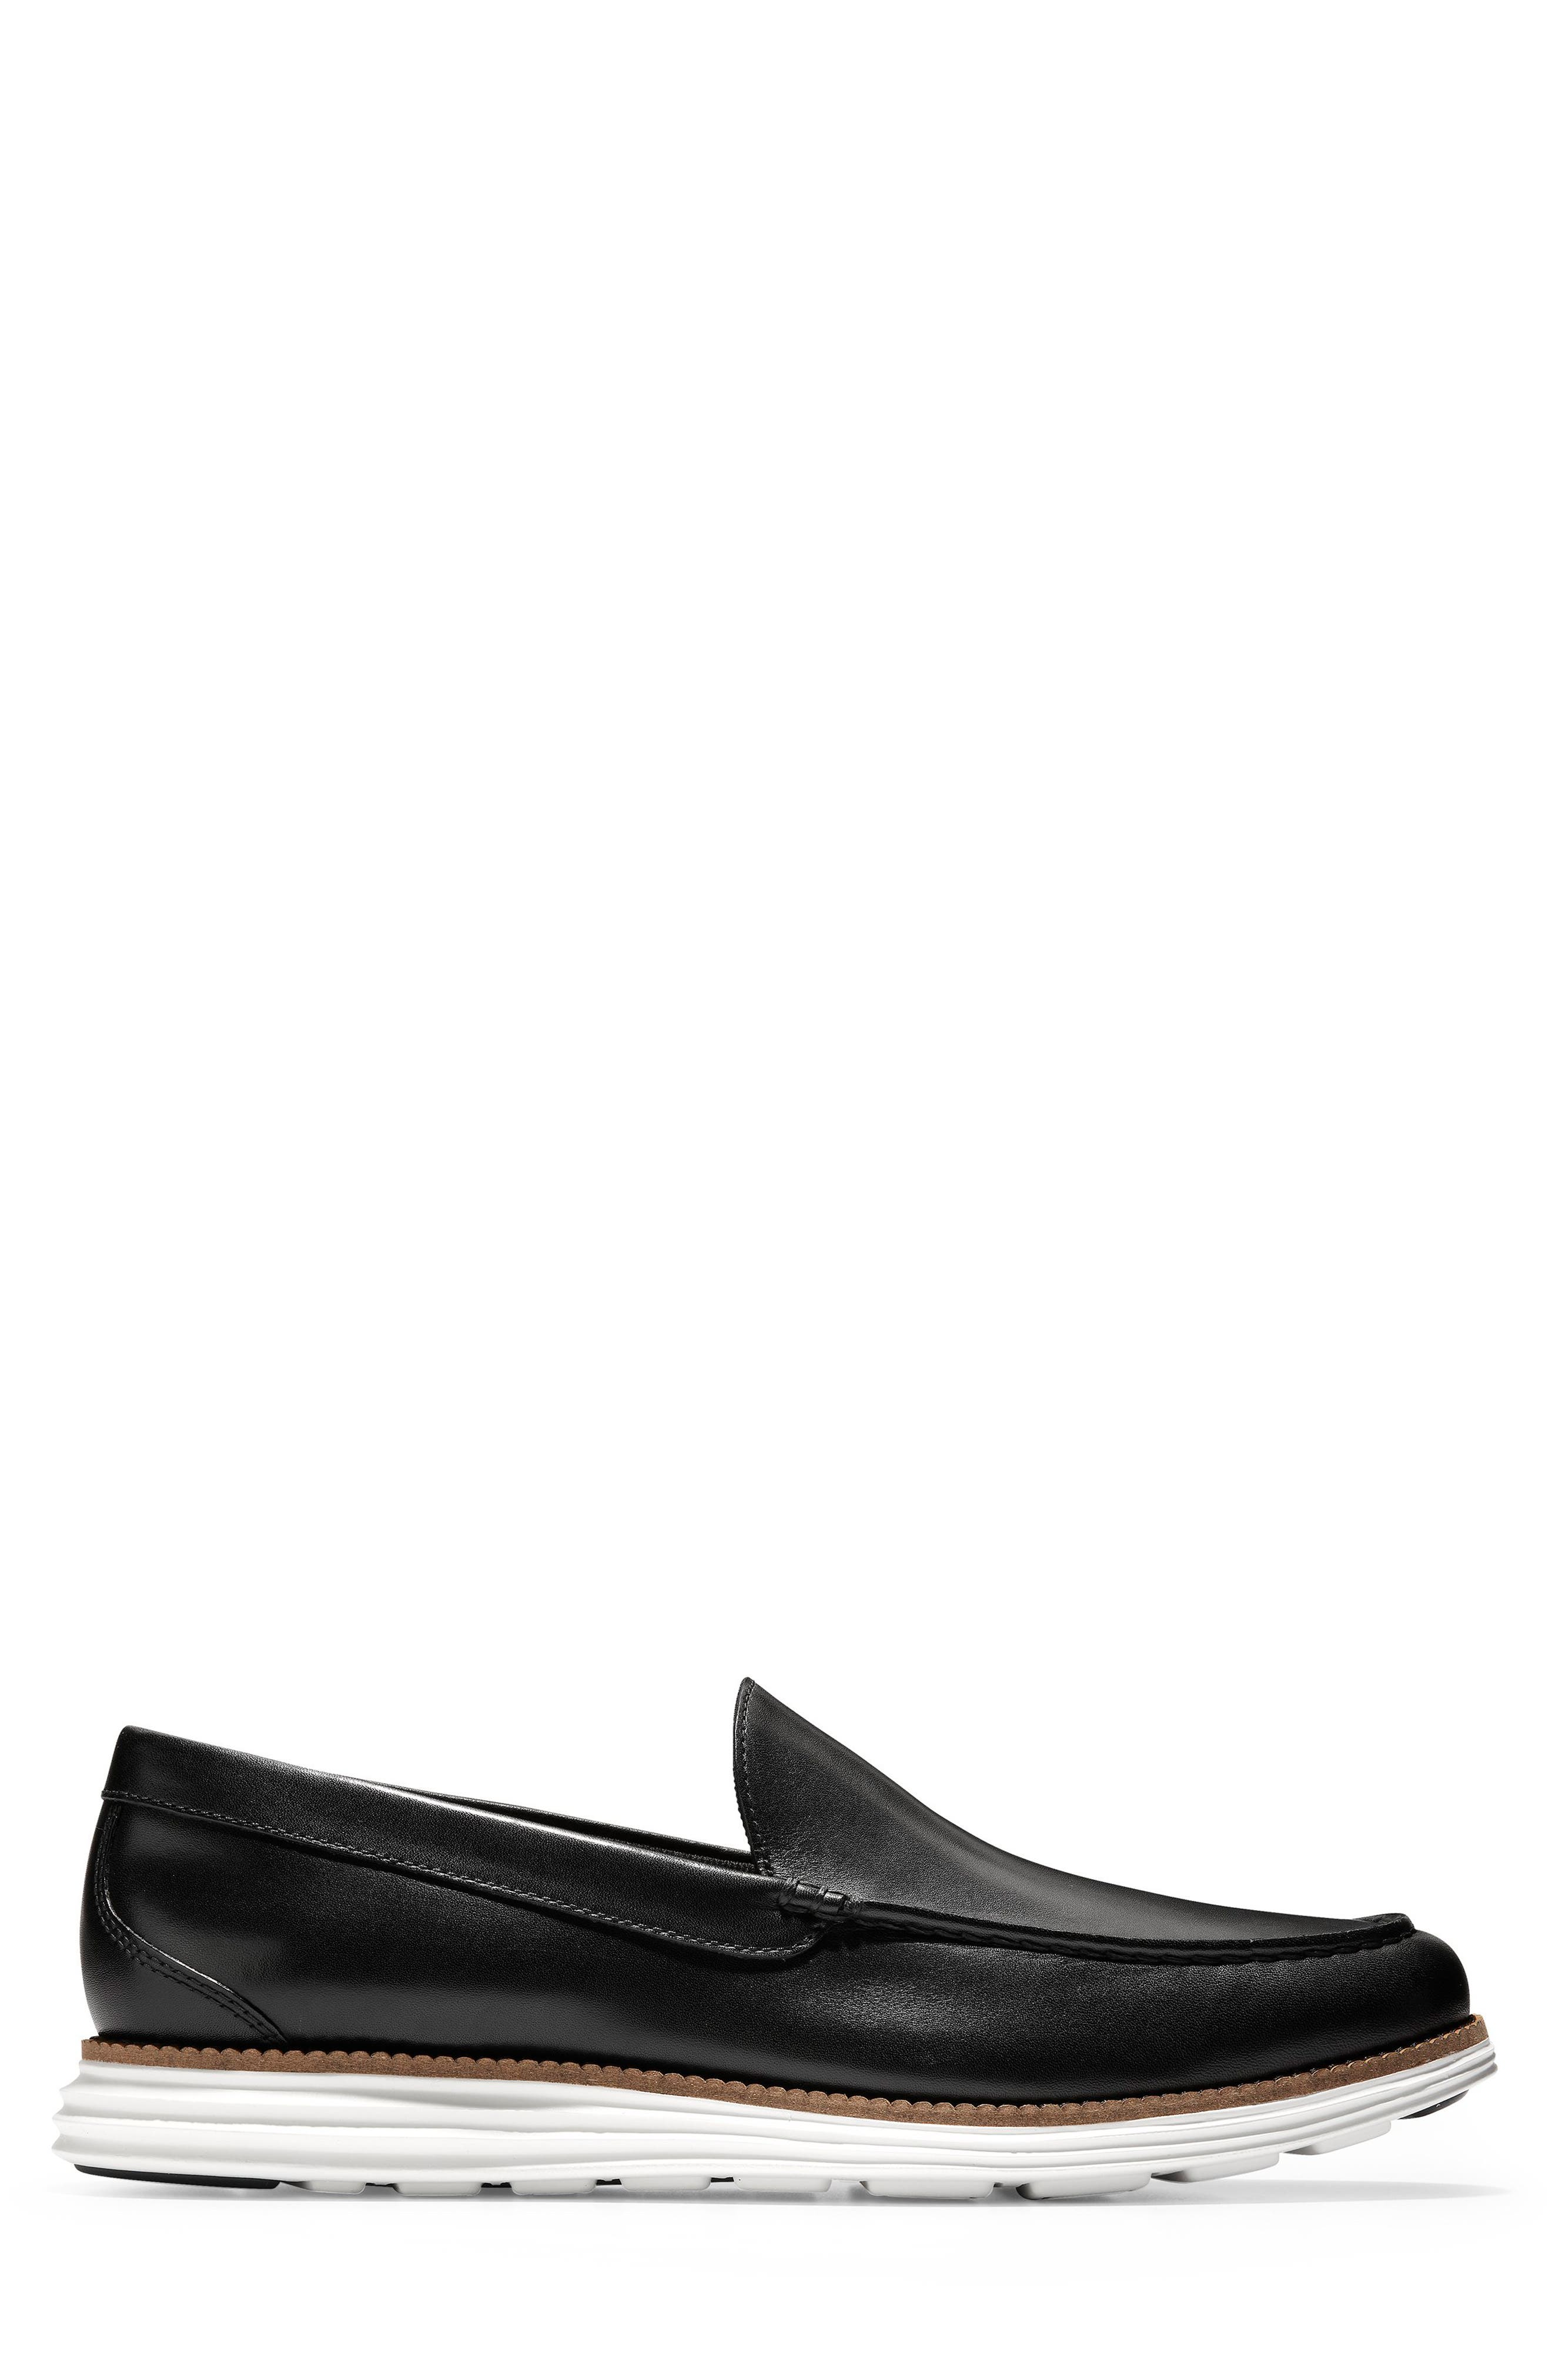 Original Grand Loafer,                             Alternate thumbnail 3, color,                             BLACK/ OPTIC WHITE LEATHER